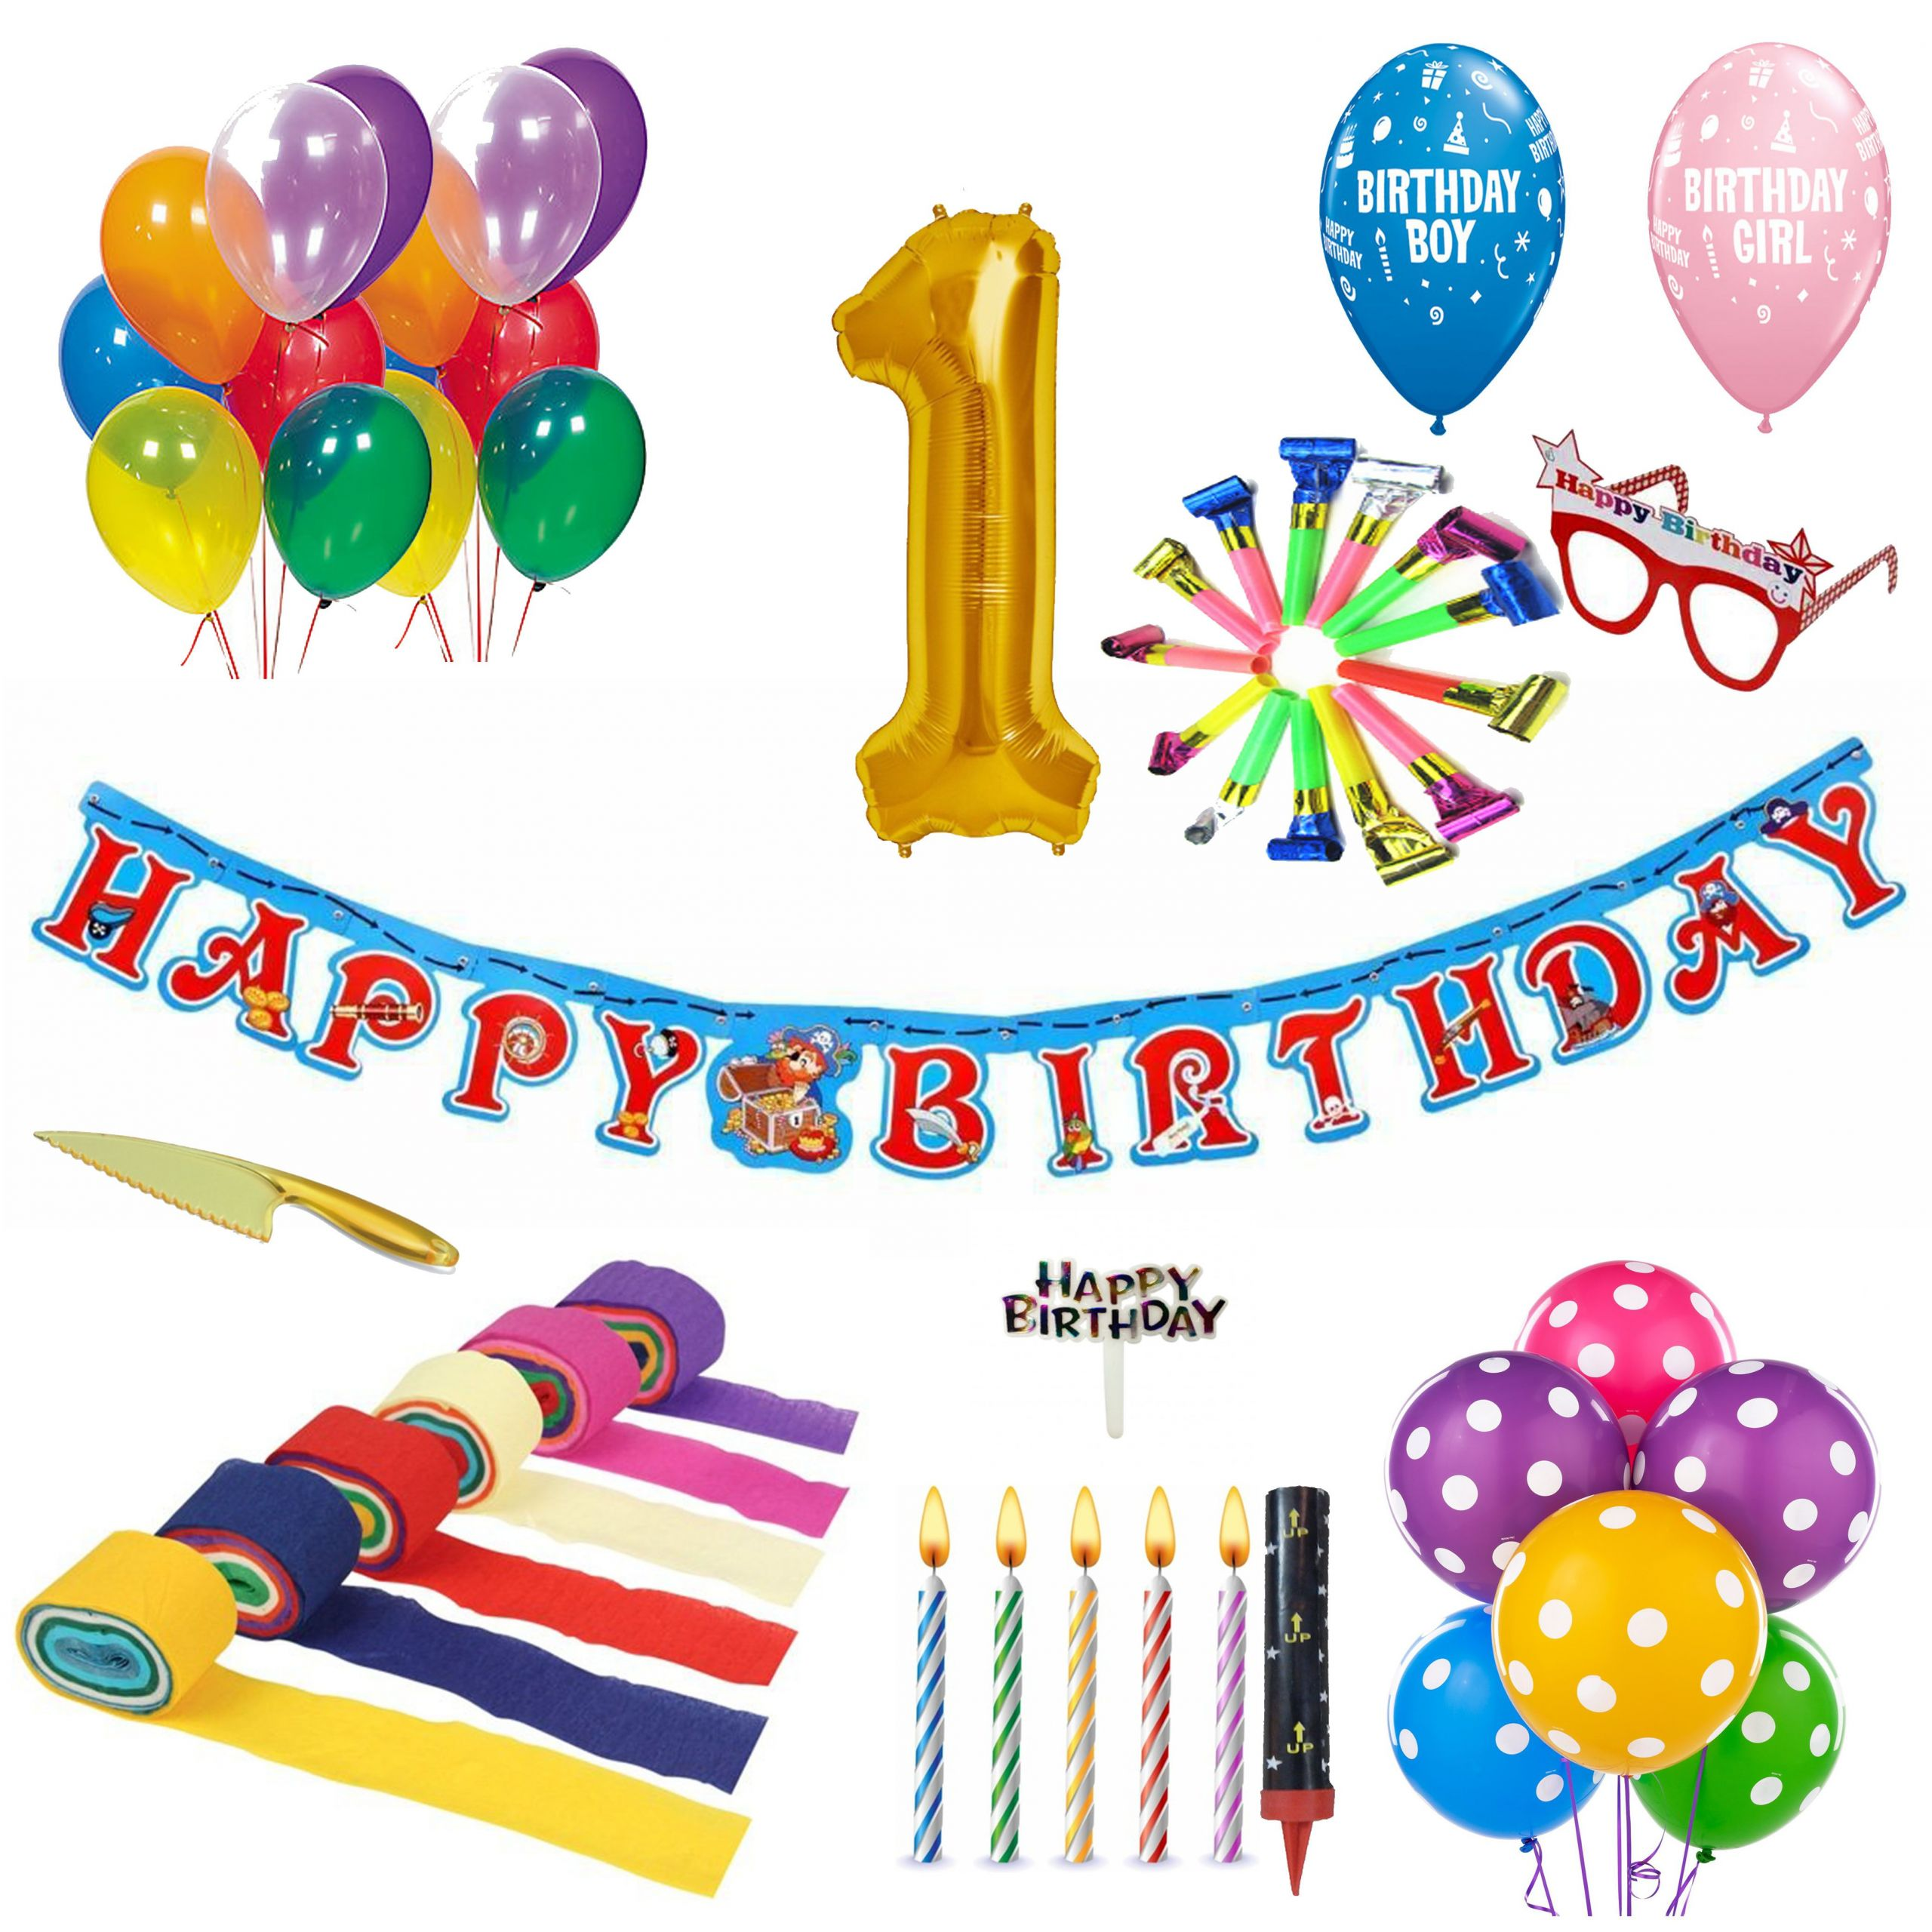 1st Birthday Decoration Kit SDL 1 b220b